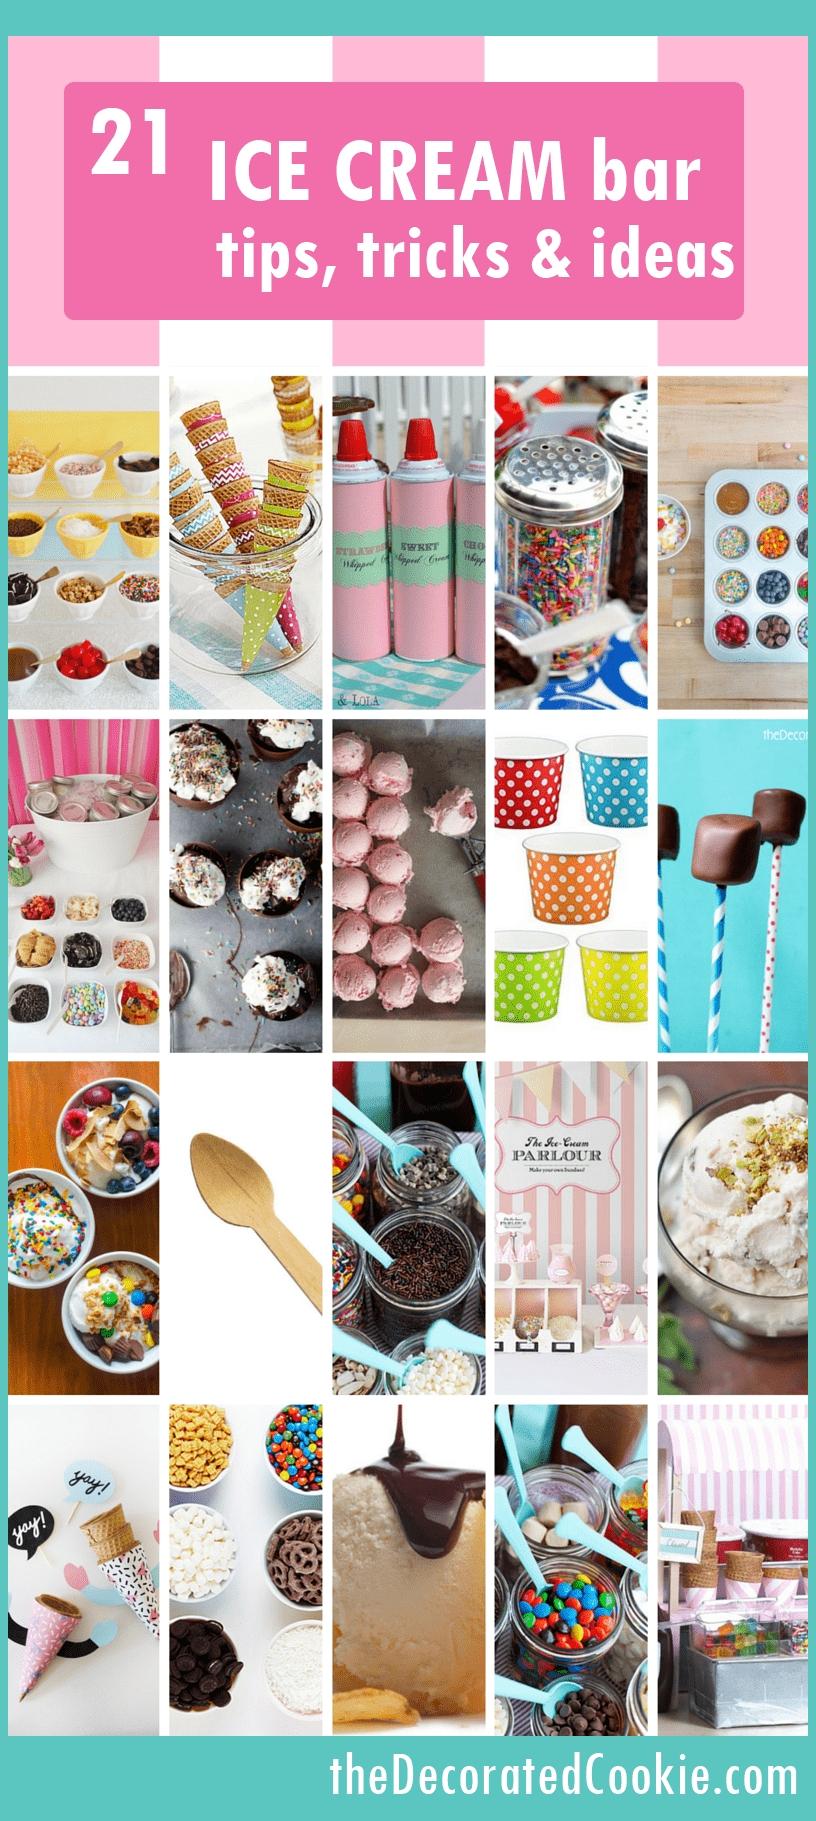 10 Beautiful Ice Cream Sundae Bar Ideas ice cream sundae bar ideas topping ideas and recipes summer party 2020